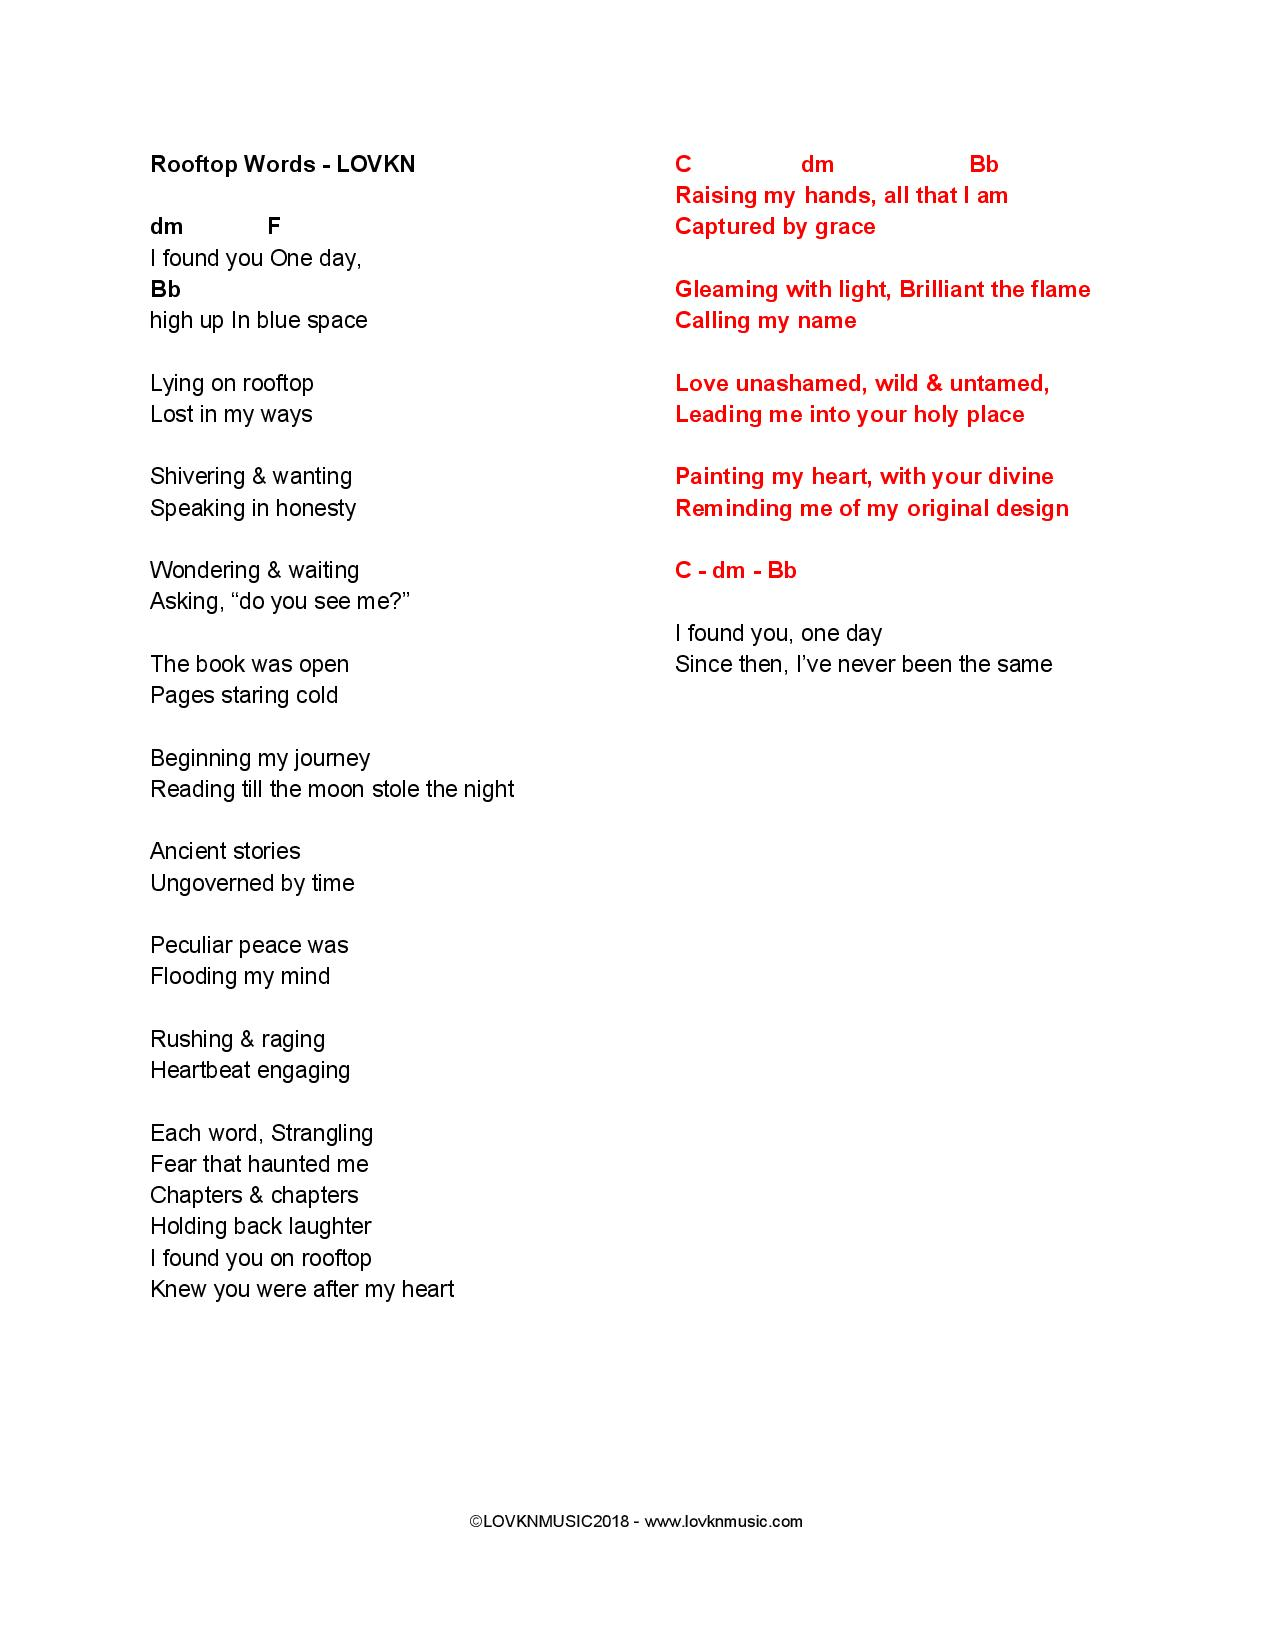 ROOFTOP WORDS (1)-page-001.jpg